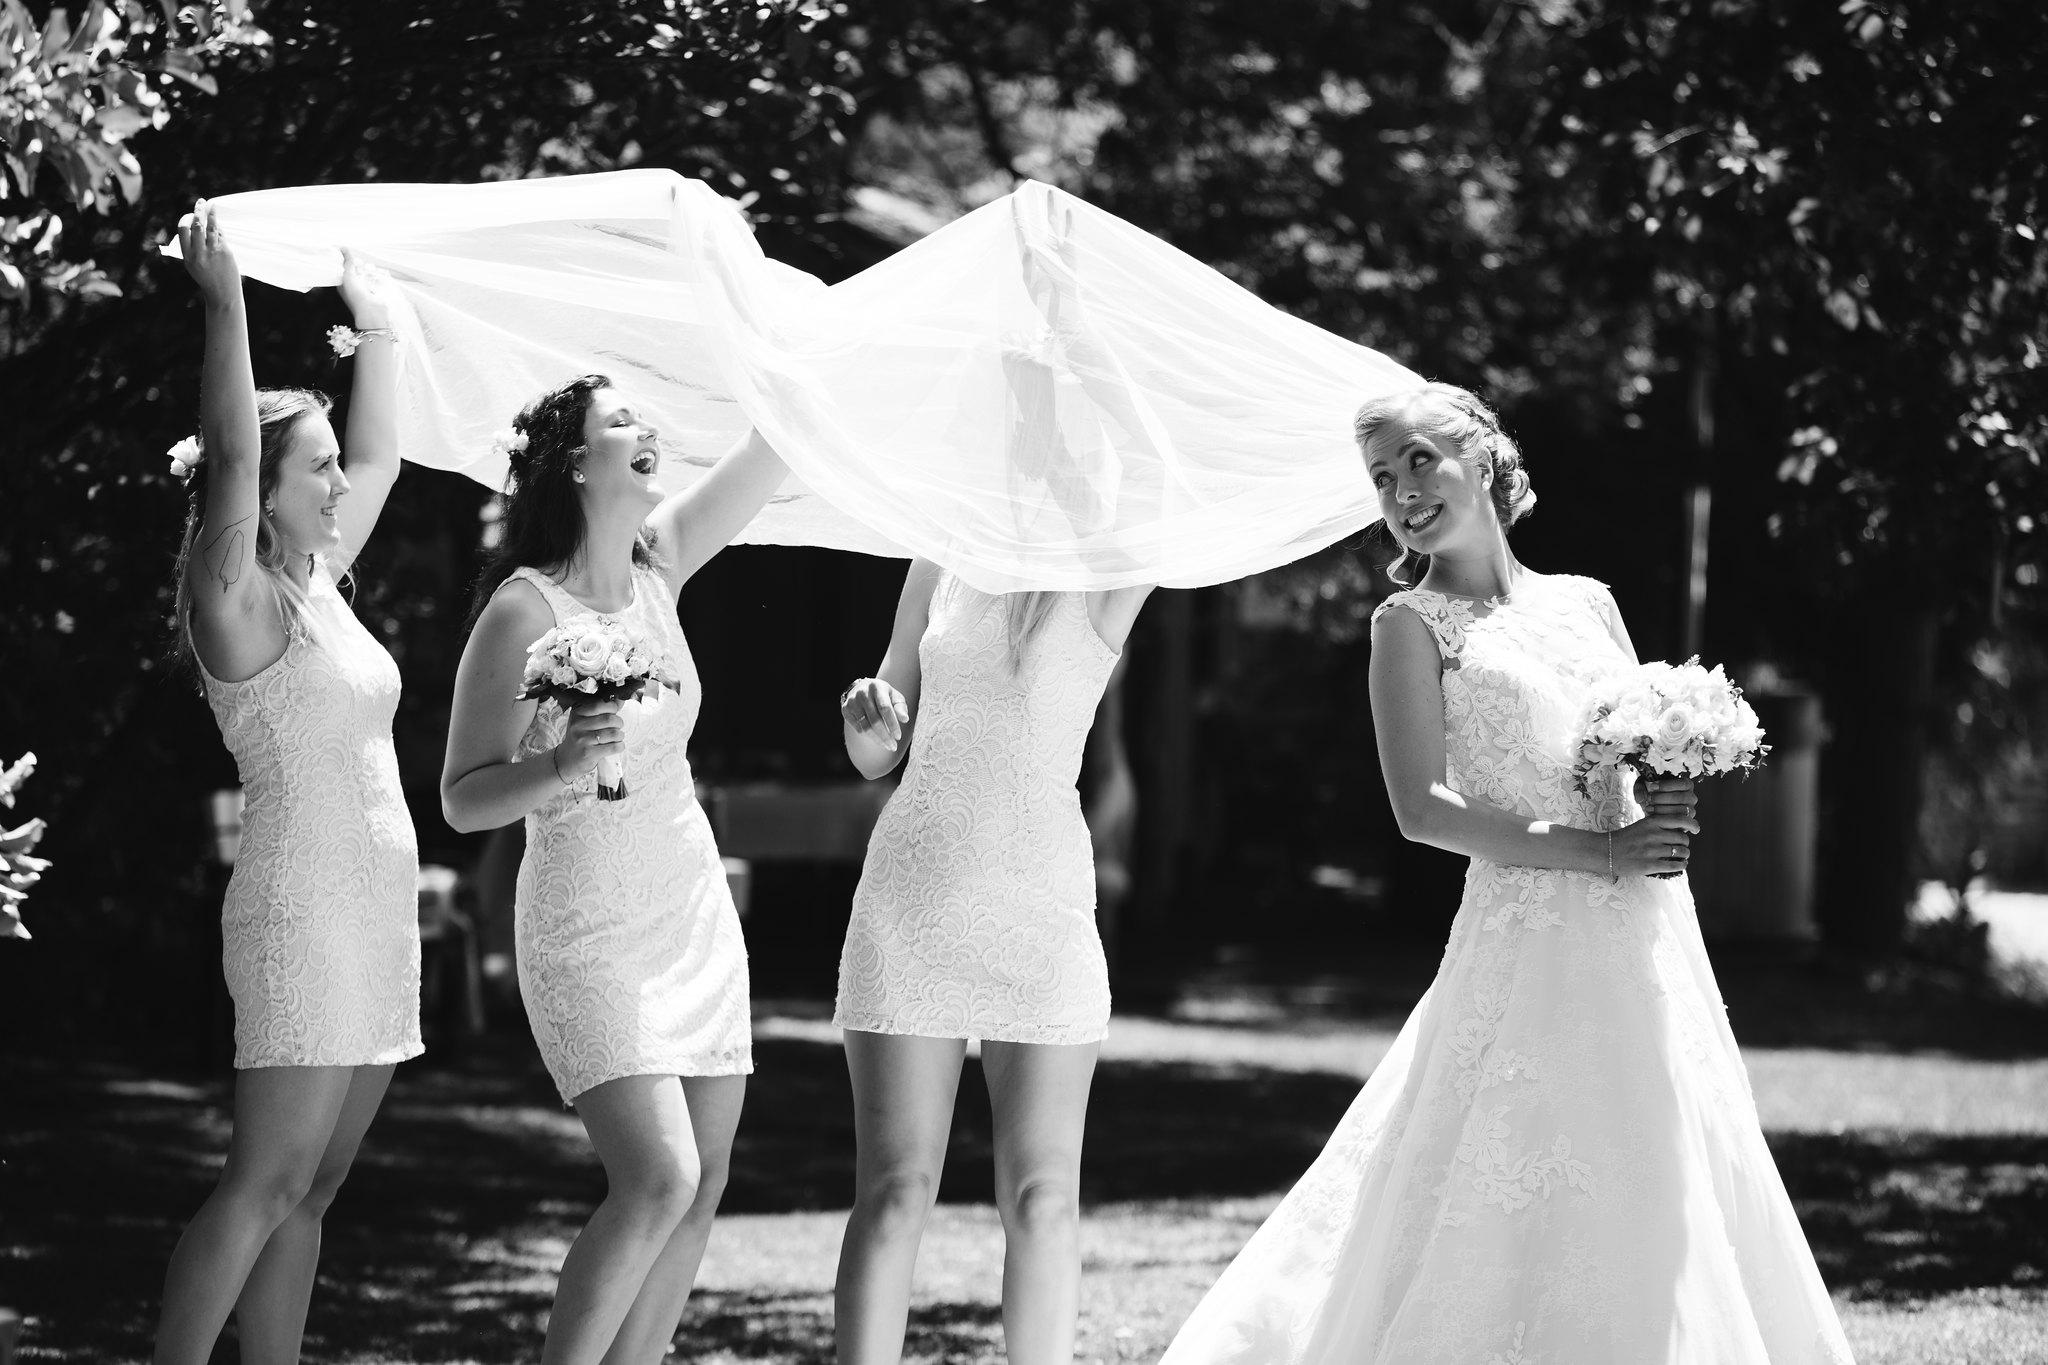 Adelka&Ales svatba